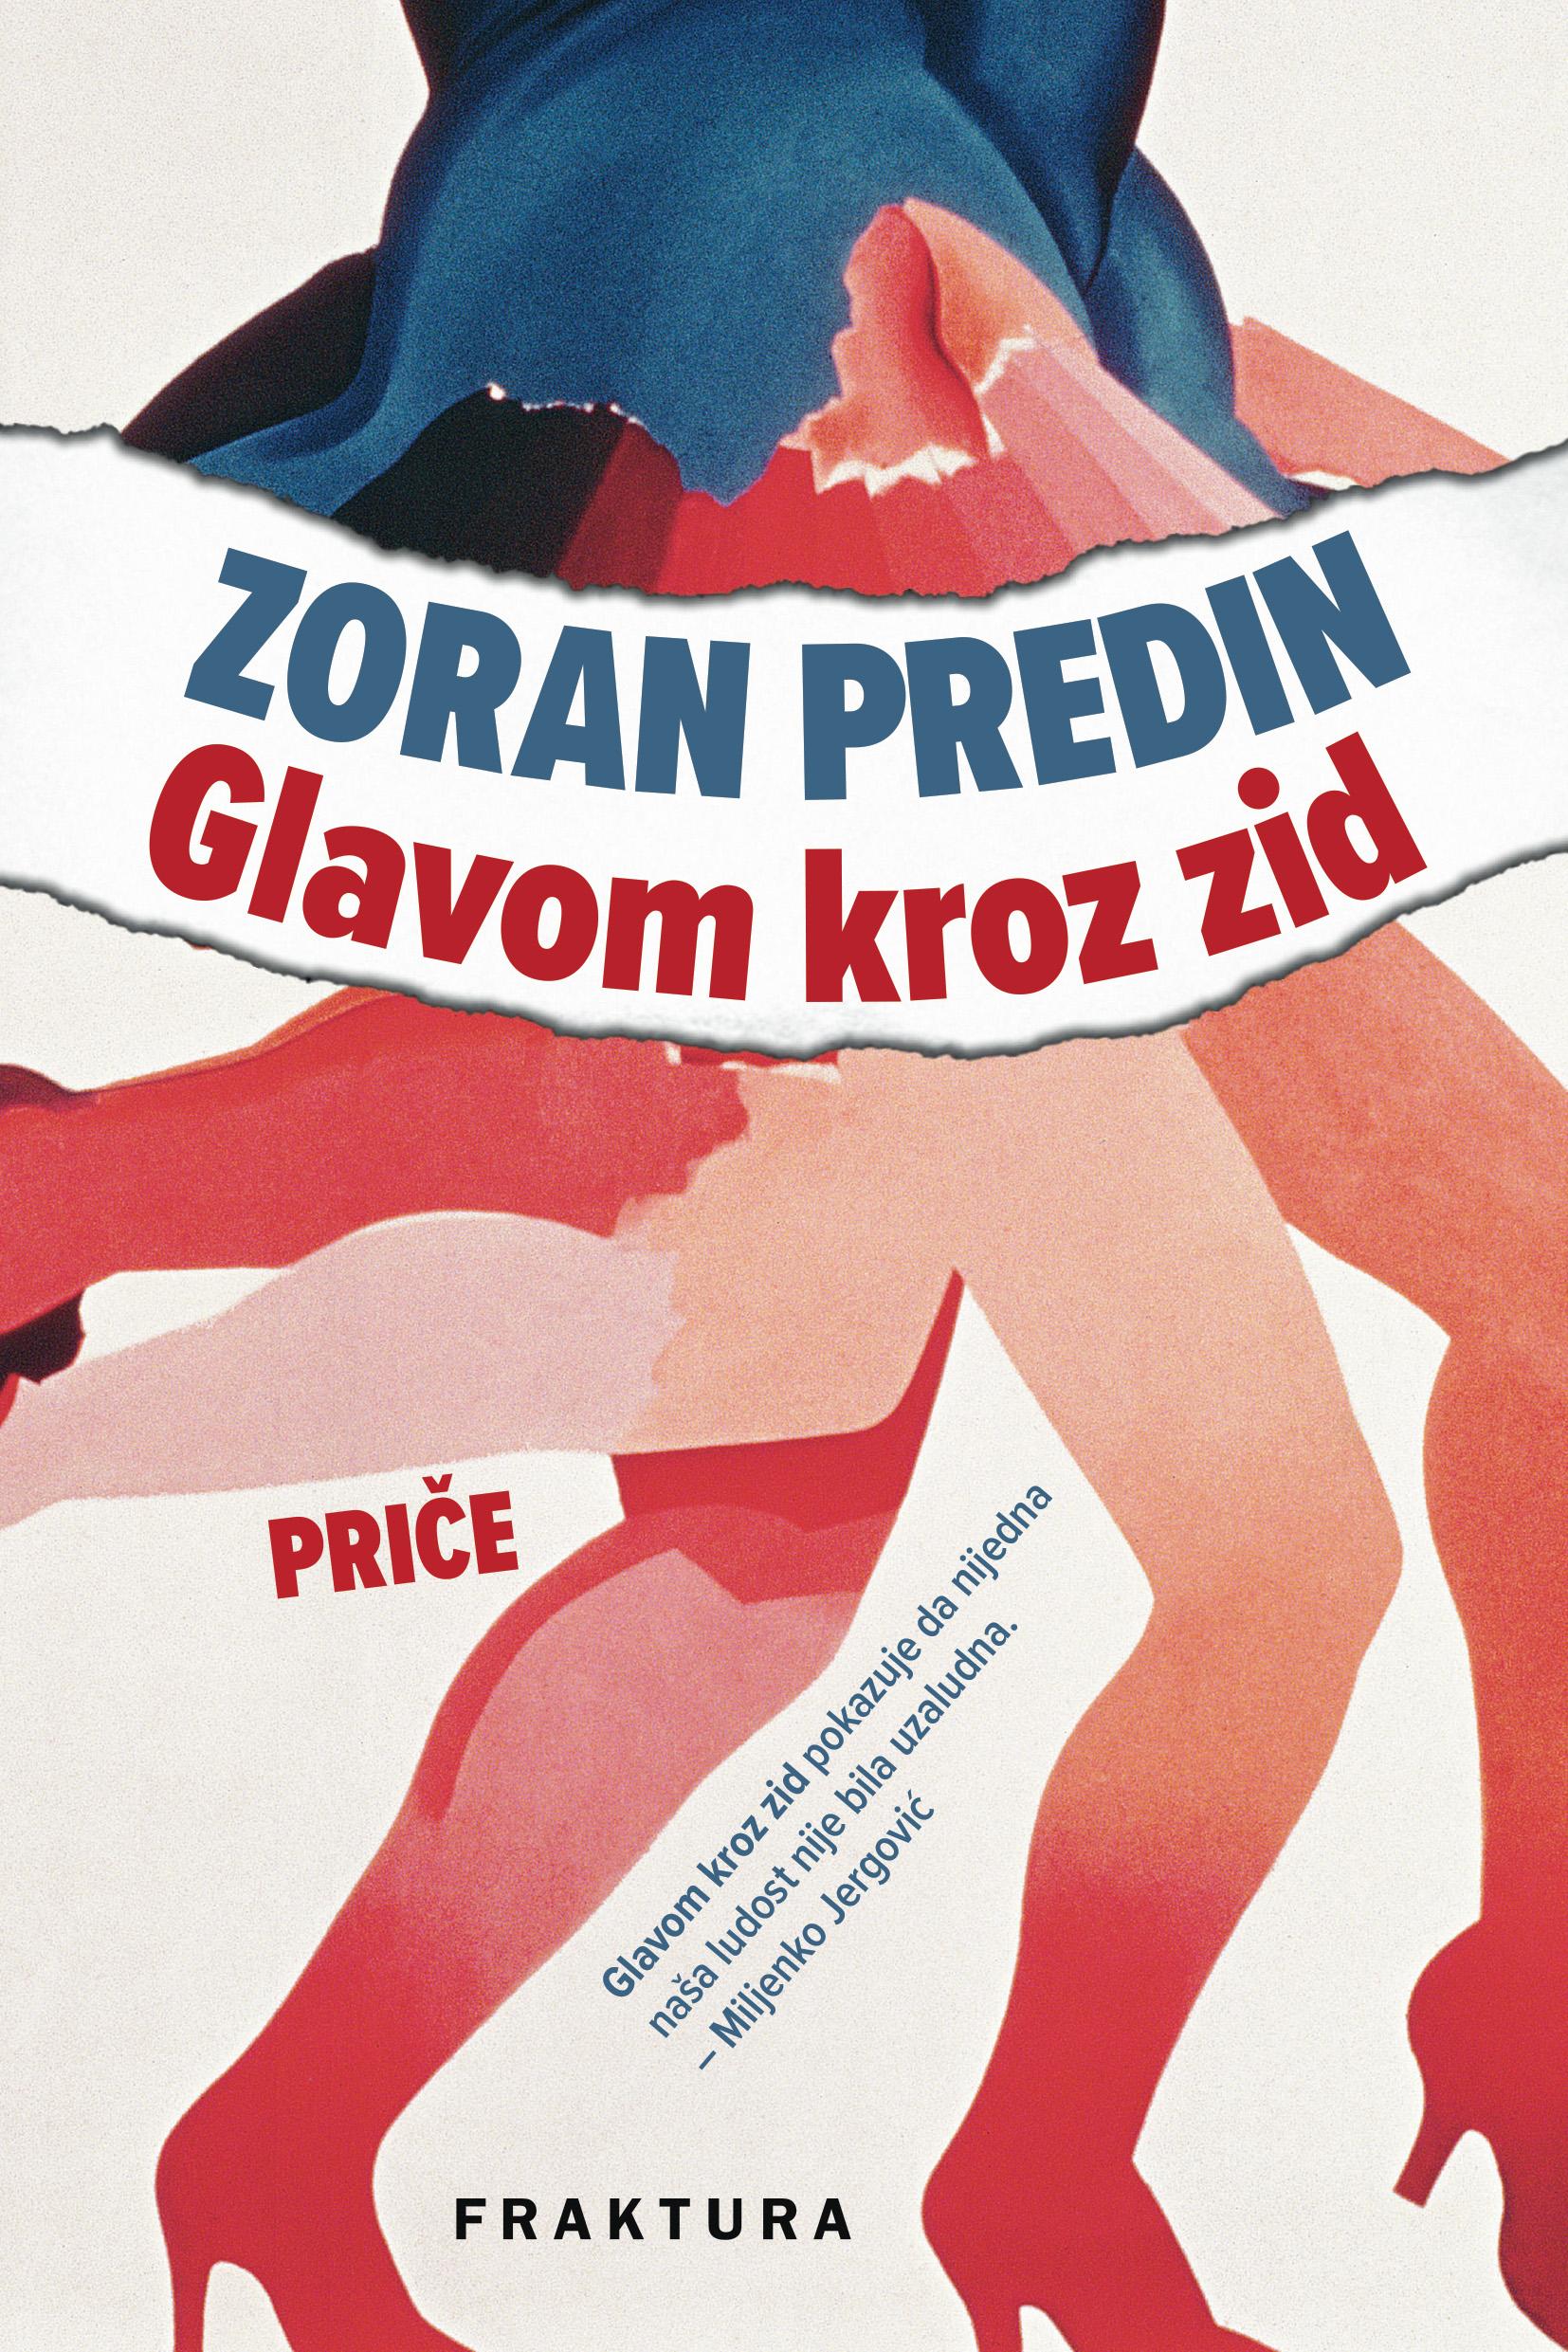 Zoran Predin u Čakovcu